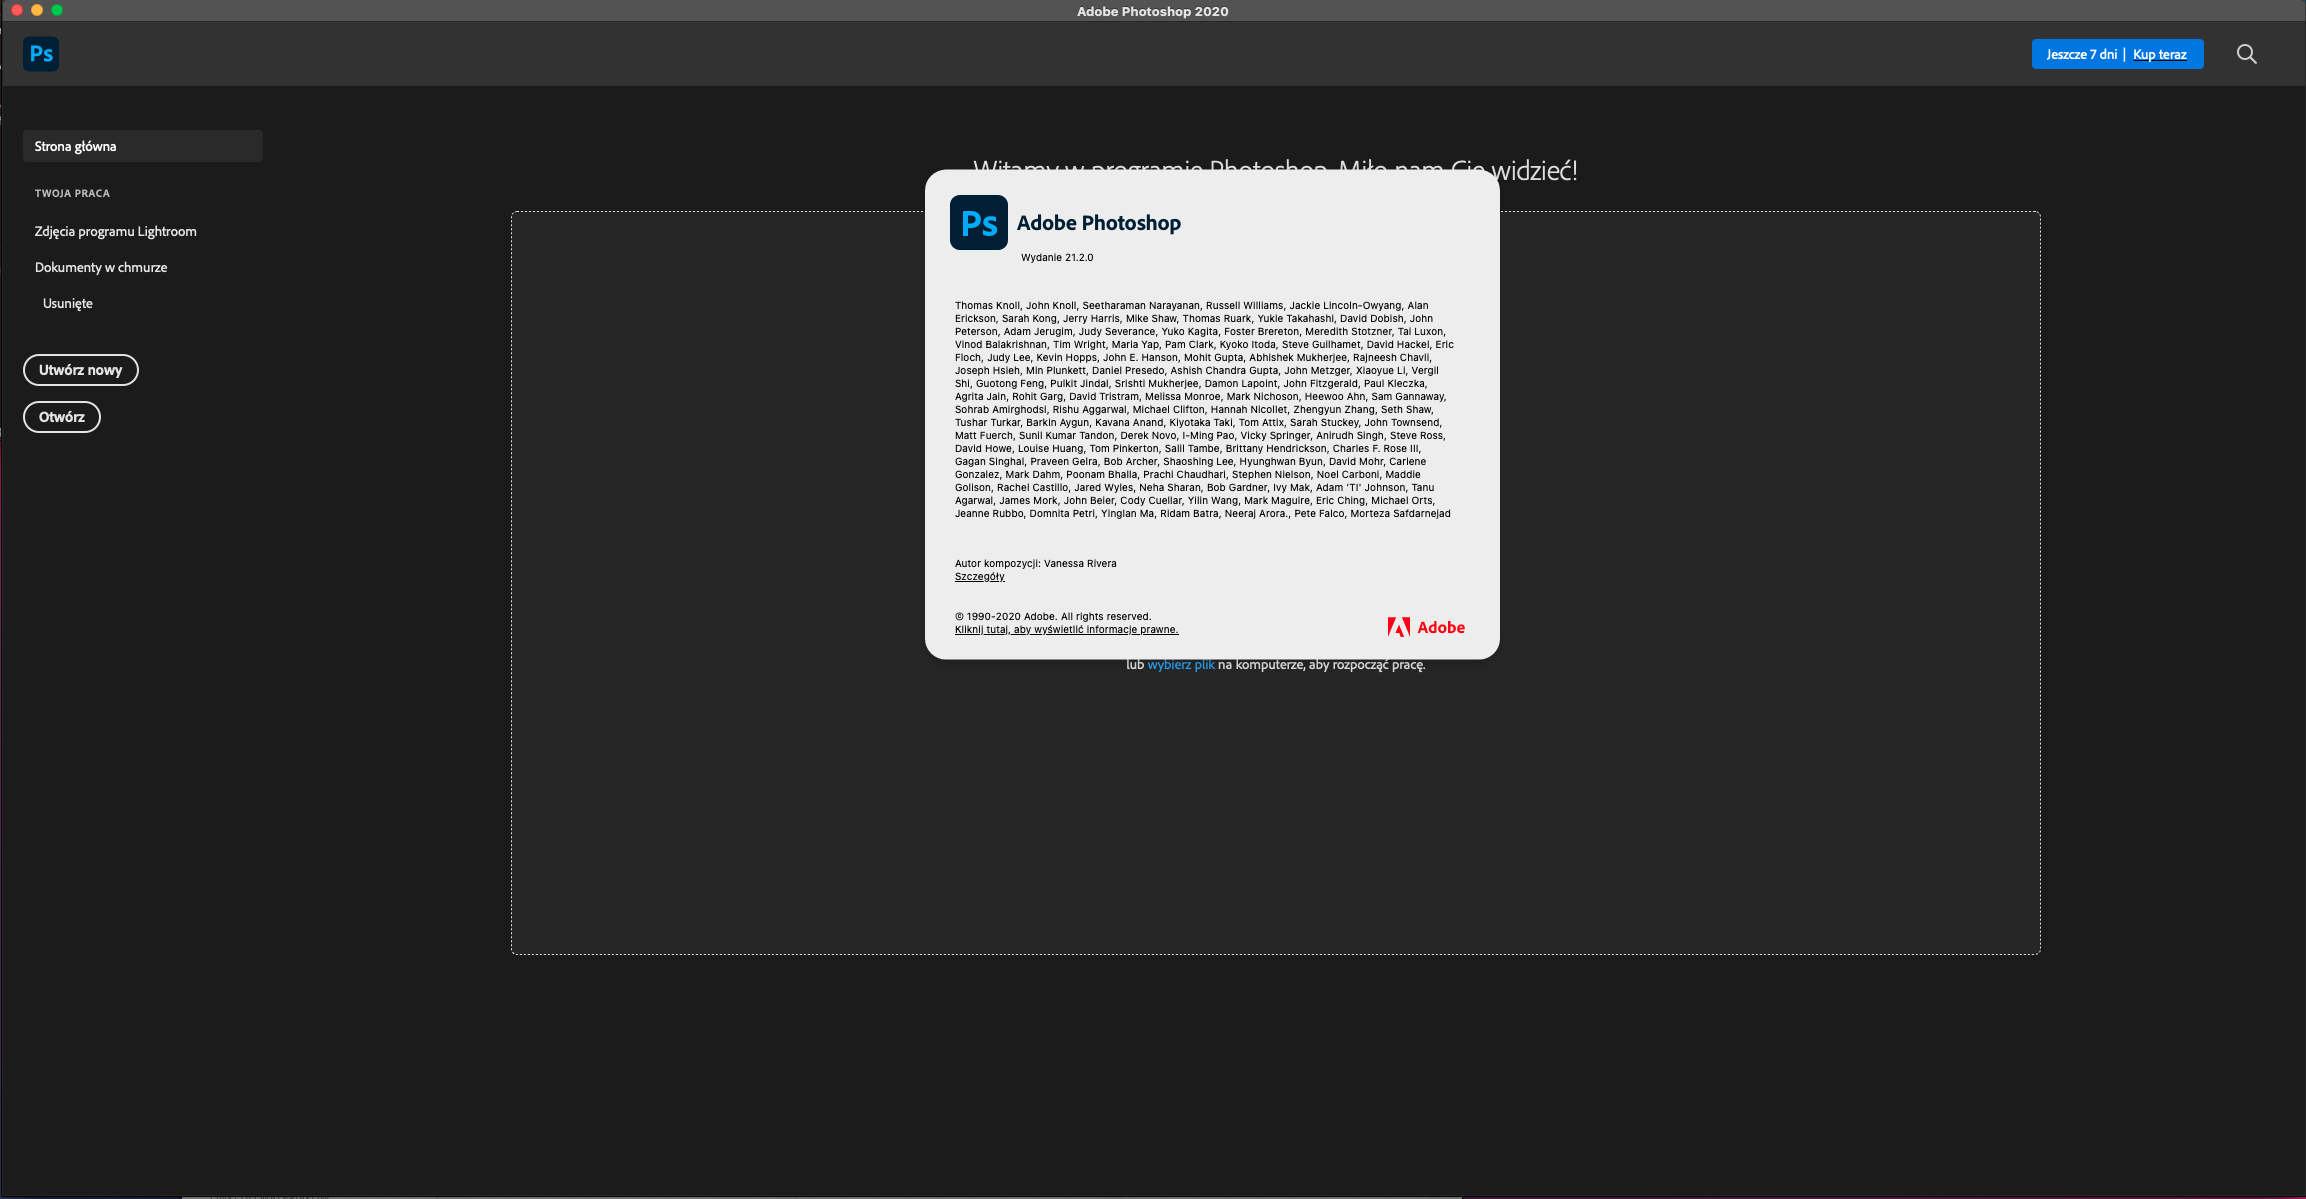 Zrzut ekranu 2020-06-28 o 13 08 54